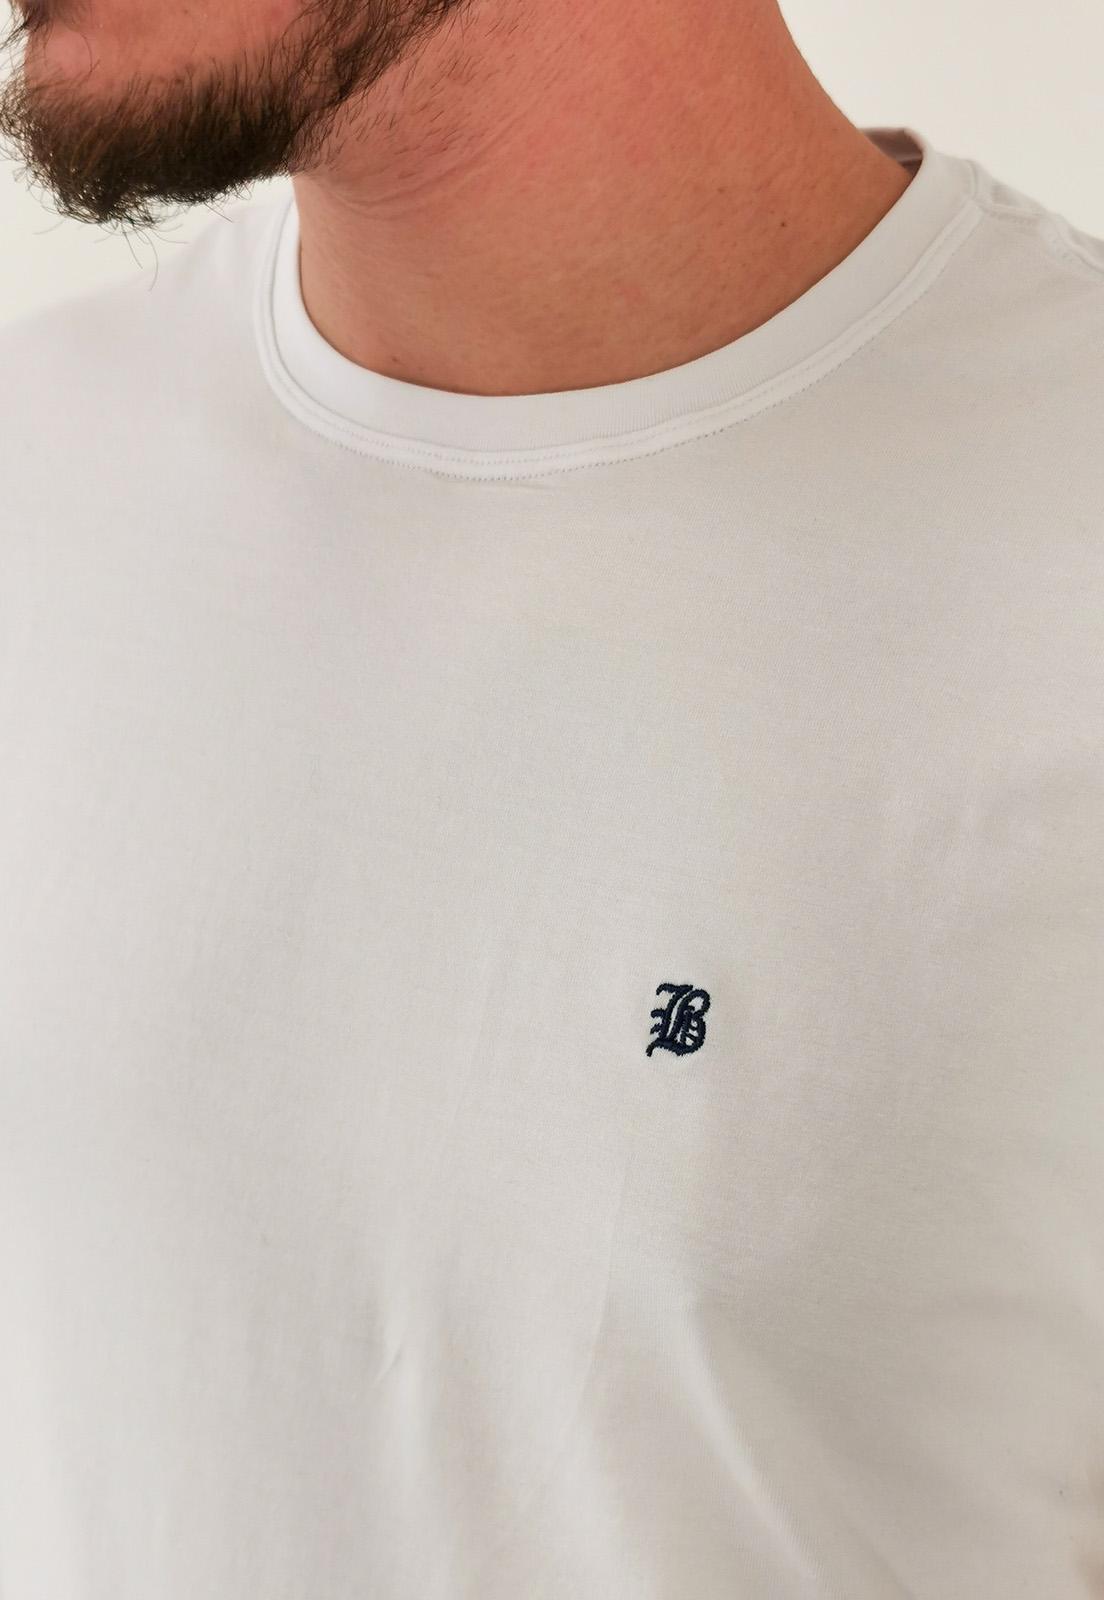 Camiseta baumgarten Básica Branca